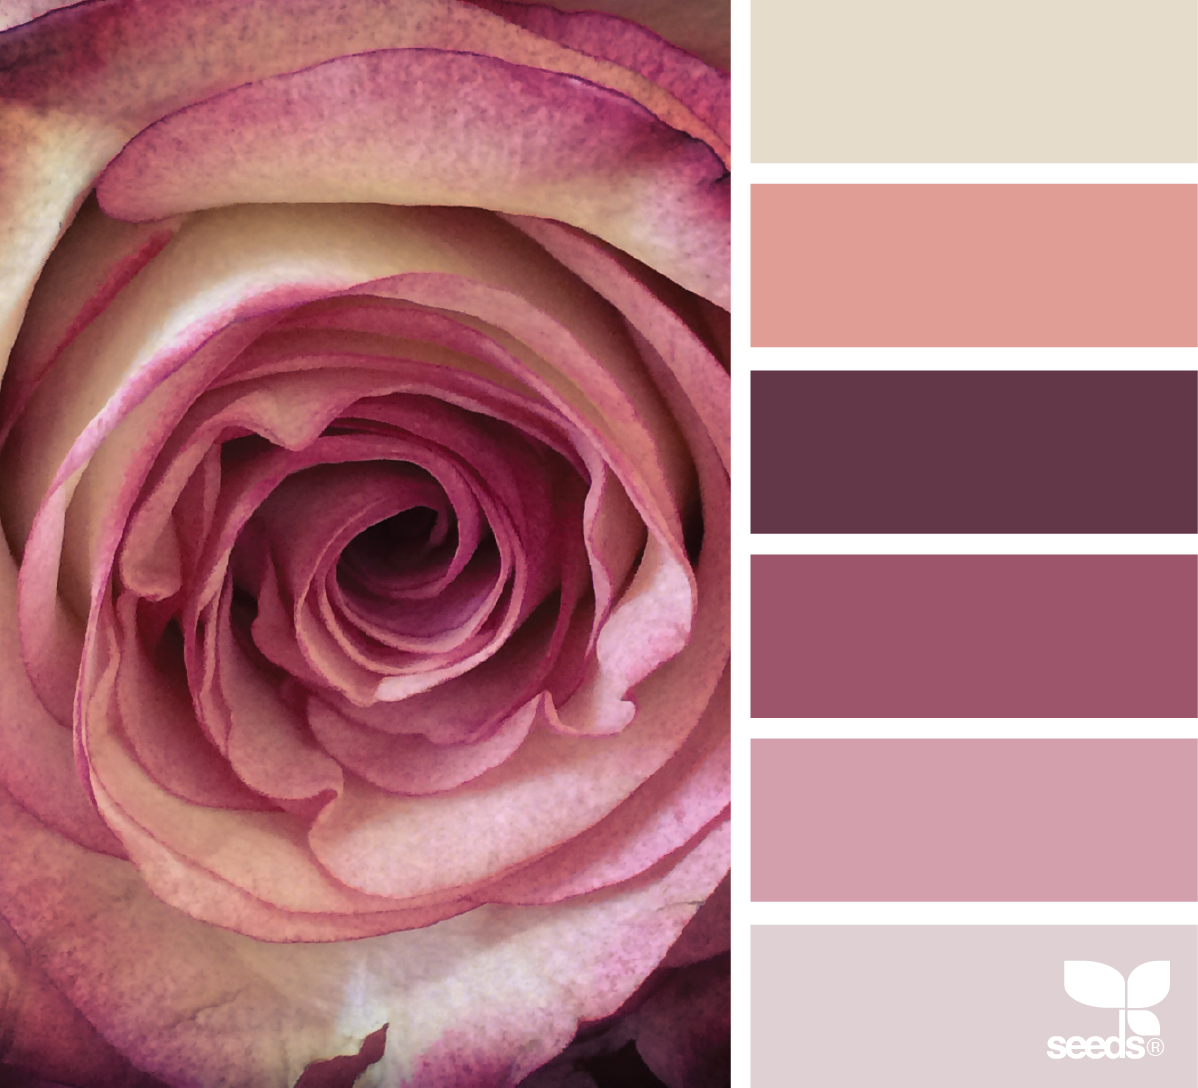 Rose Hues | Rose, Color inspiration and Design seeds